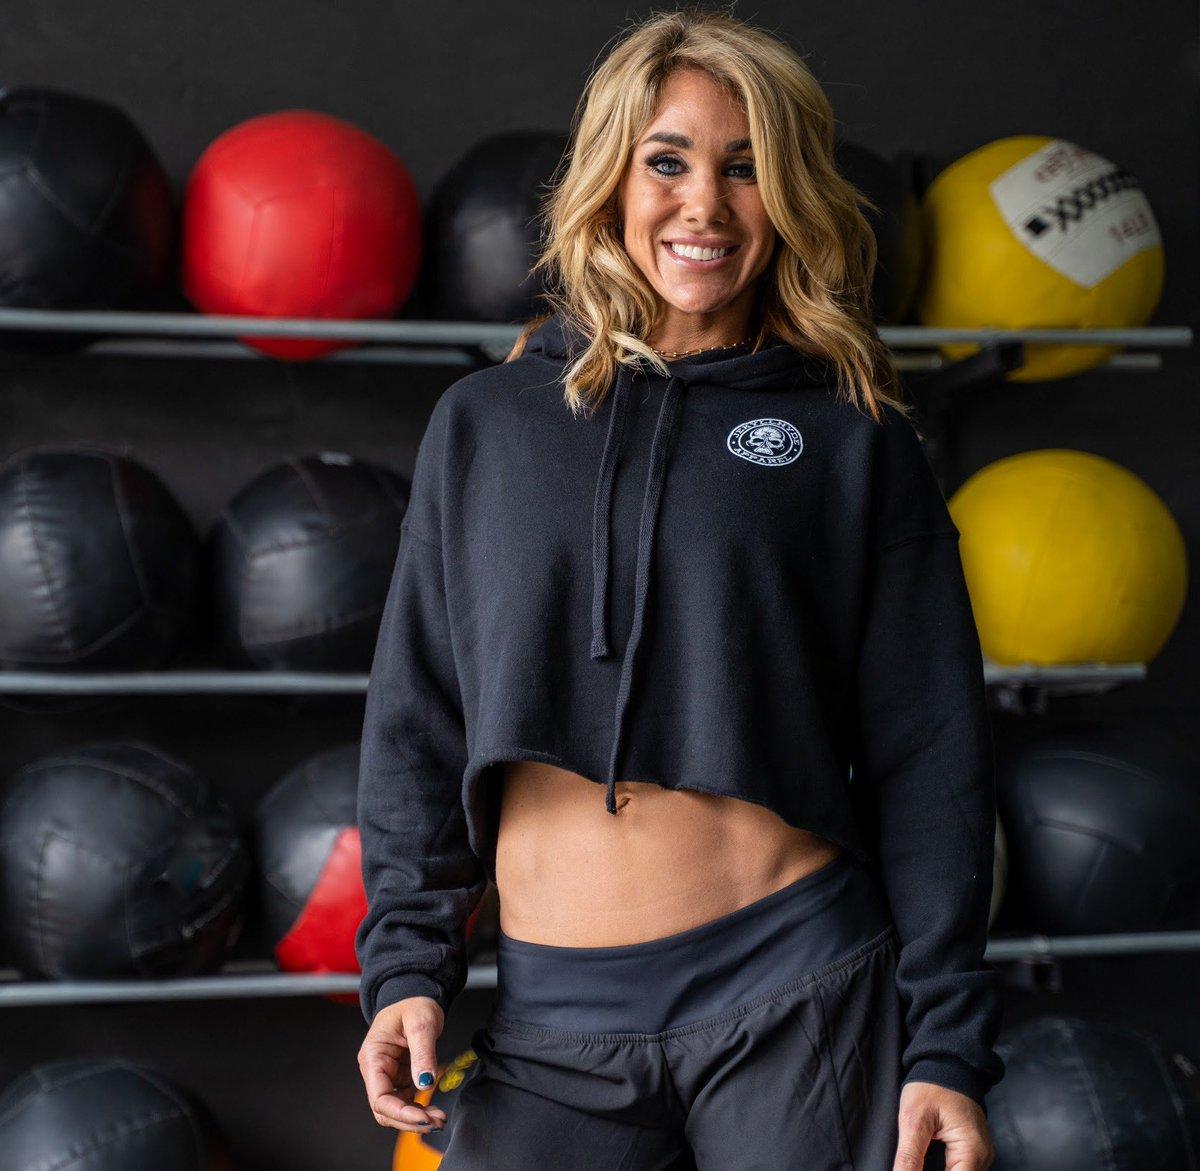 Only a few Premium Crop hoodies left! https://t.co/rXdvtxr5fP . . #crop #hoodie #pullover #fall #croptop #jekyllhyde #jh #skull #beaker #wallballs #fitness #gym #womenwholift #hwpo #fitwomen https://t.co/OYVxFQNVy5